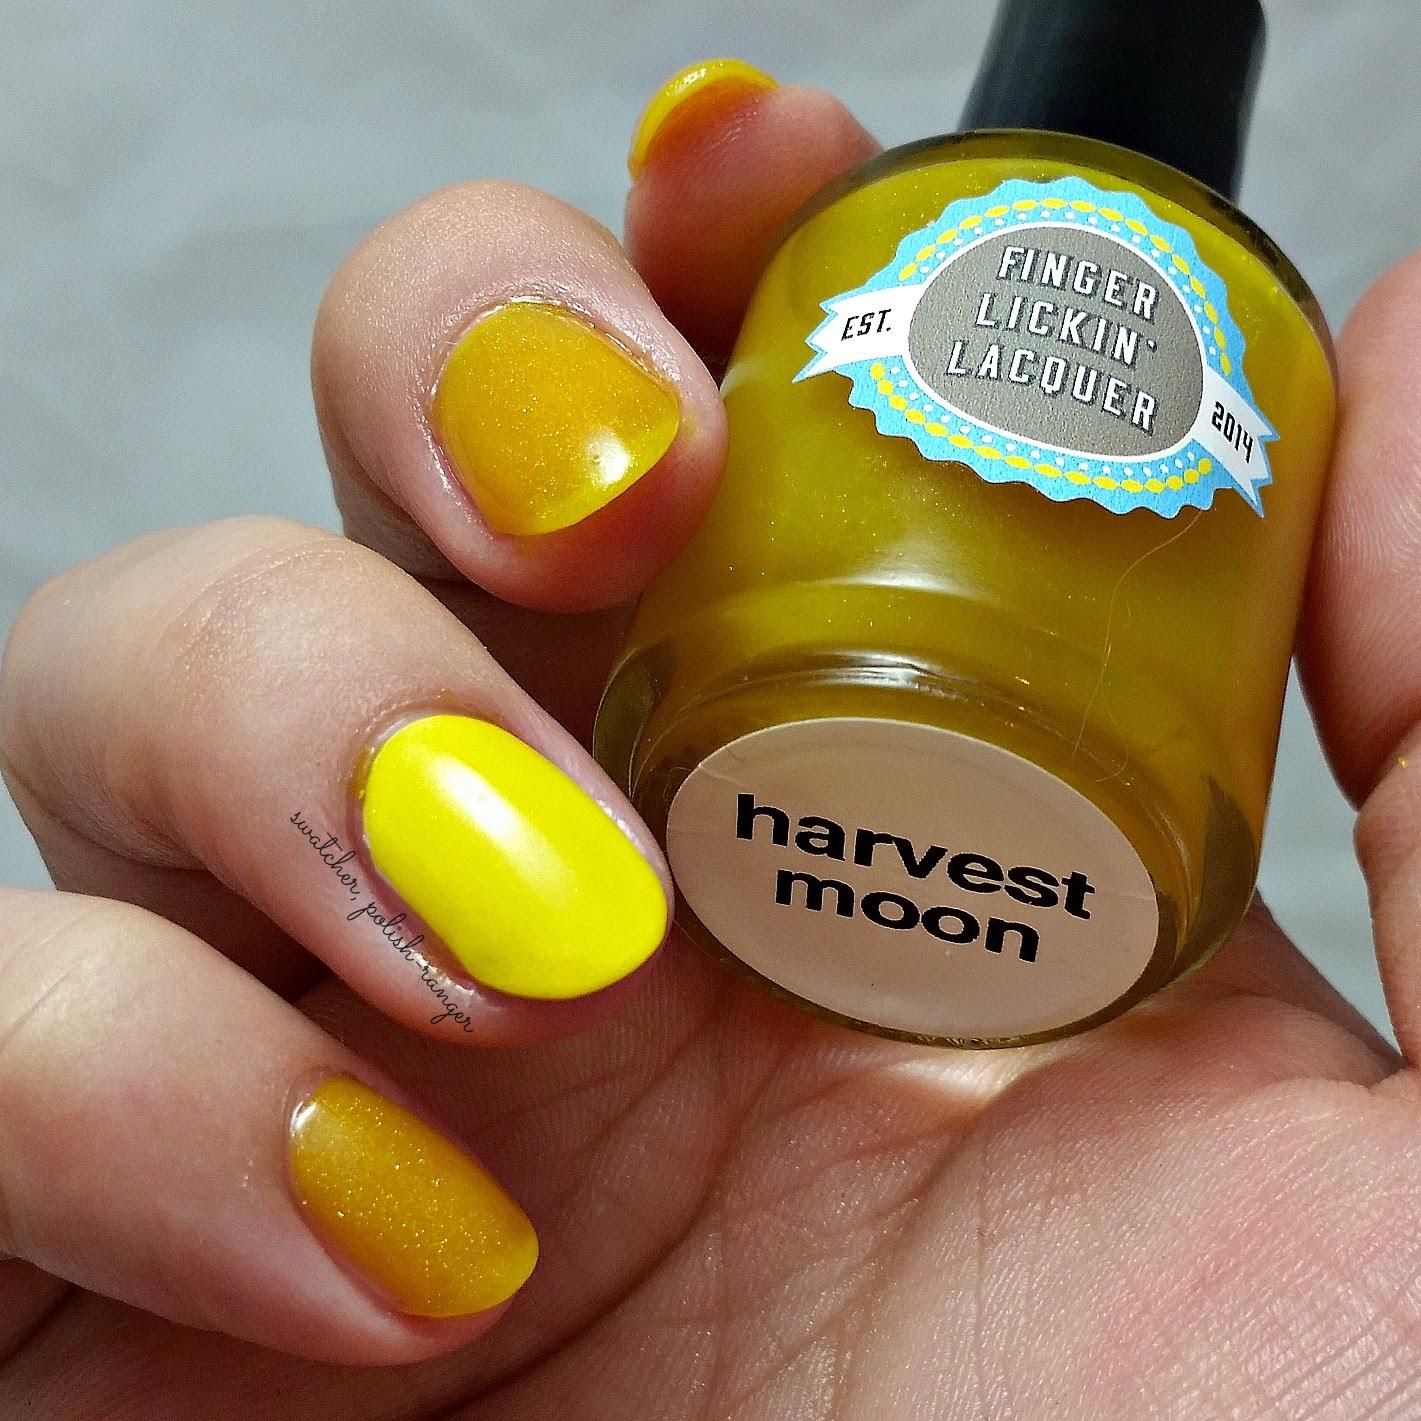 swatcher, polish-ranger | Finger Lickin Lacquer Harvest Moon swatch